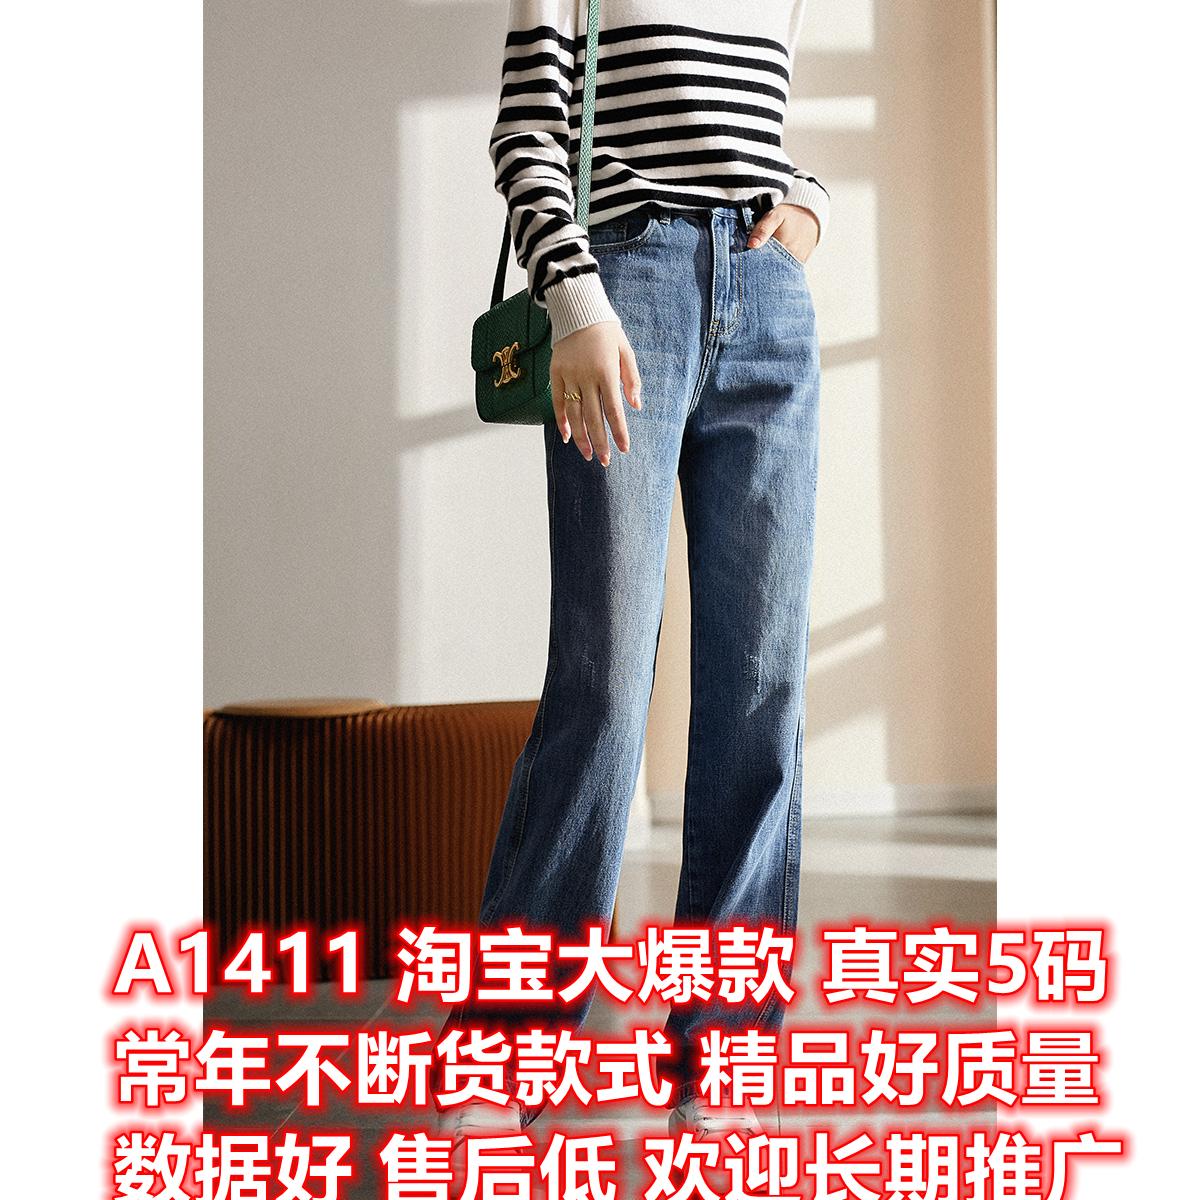 [KZK461458AG]笑涵閣 秒變大長腿 純棉 時髦顯瘦寬松牛仔褲